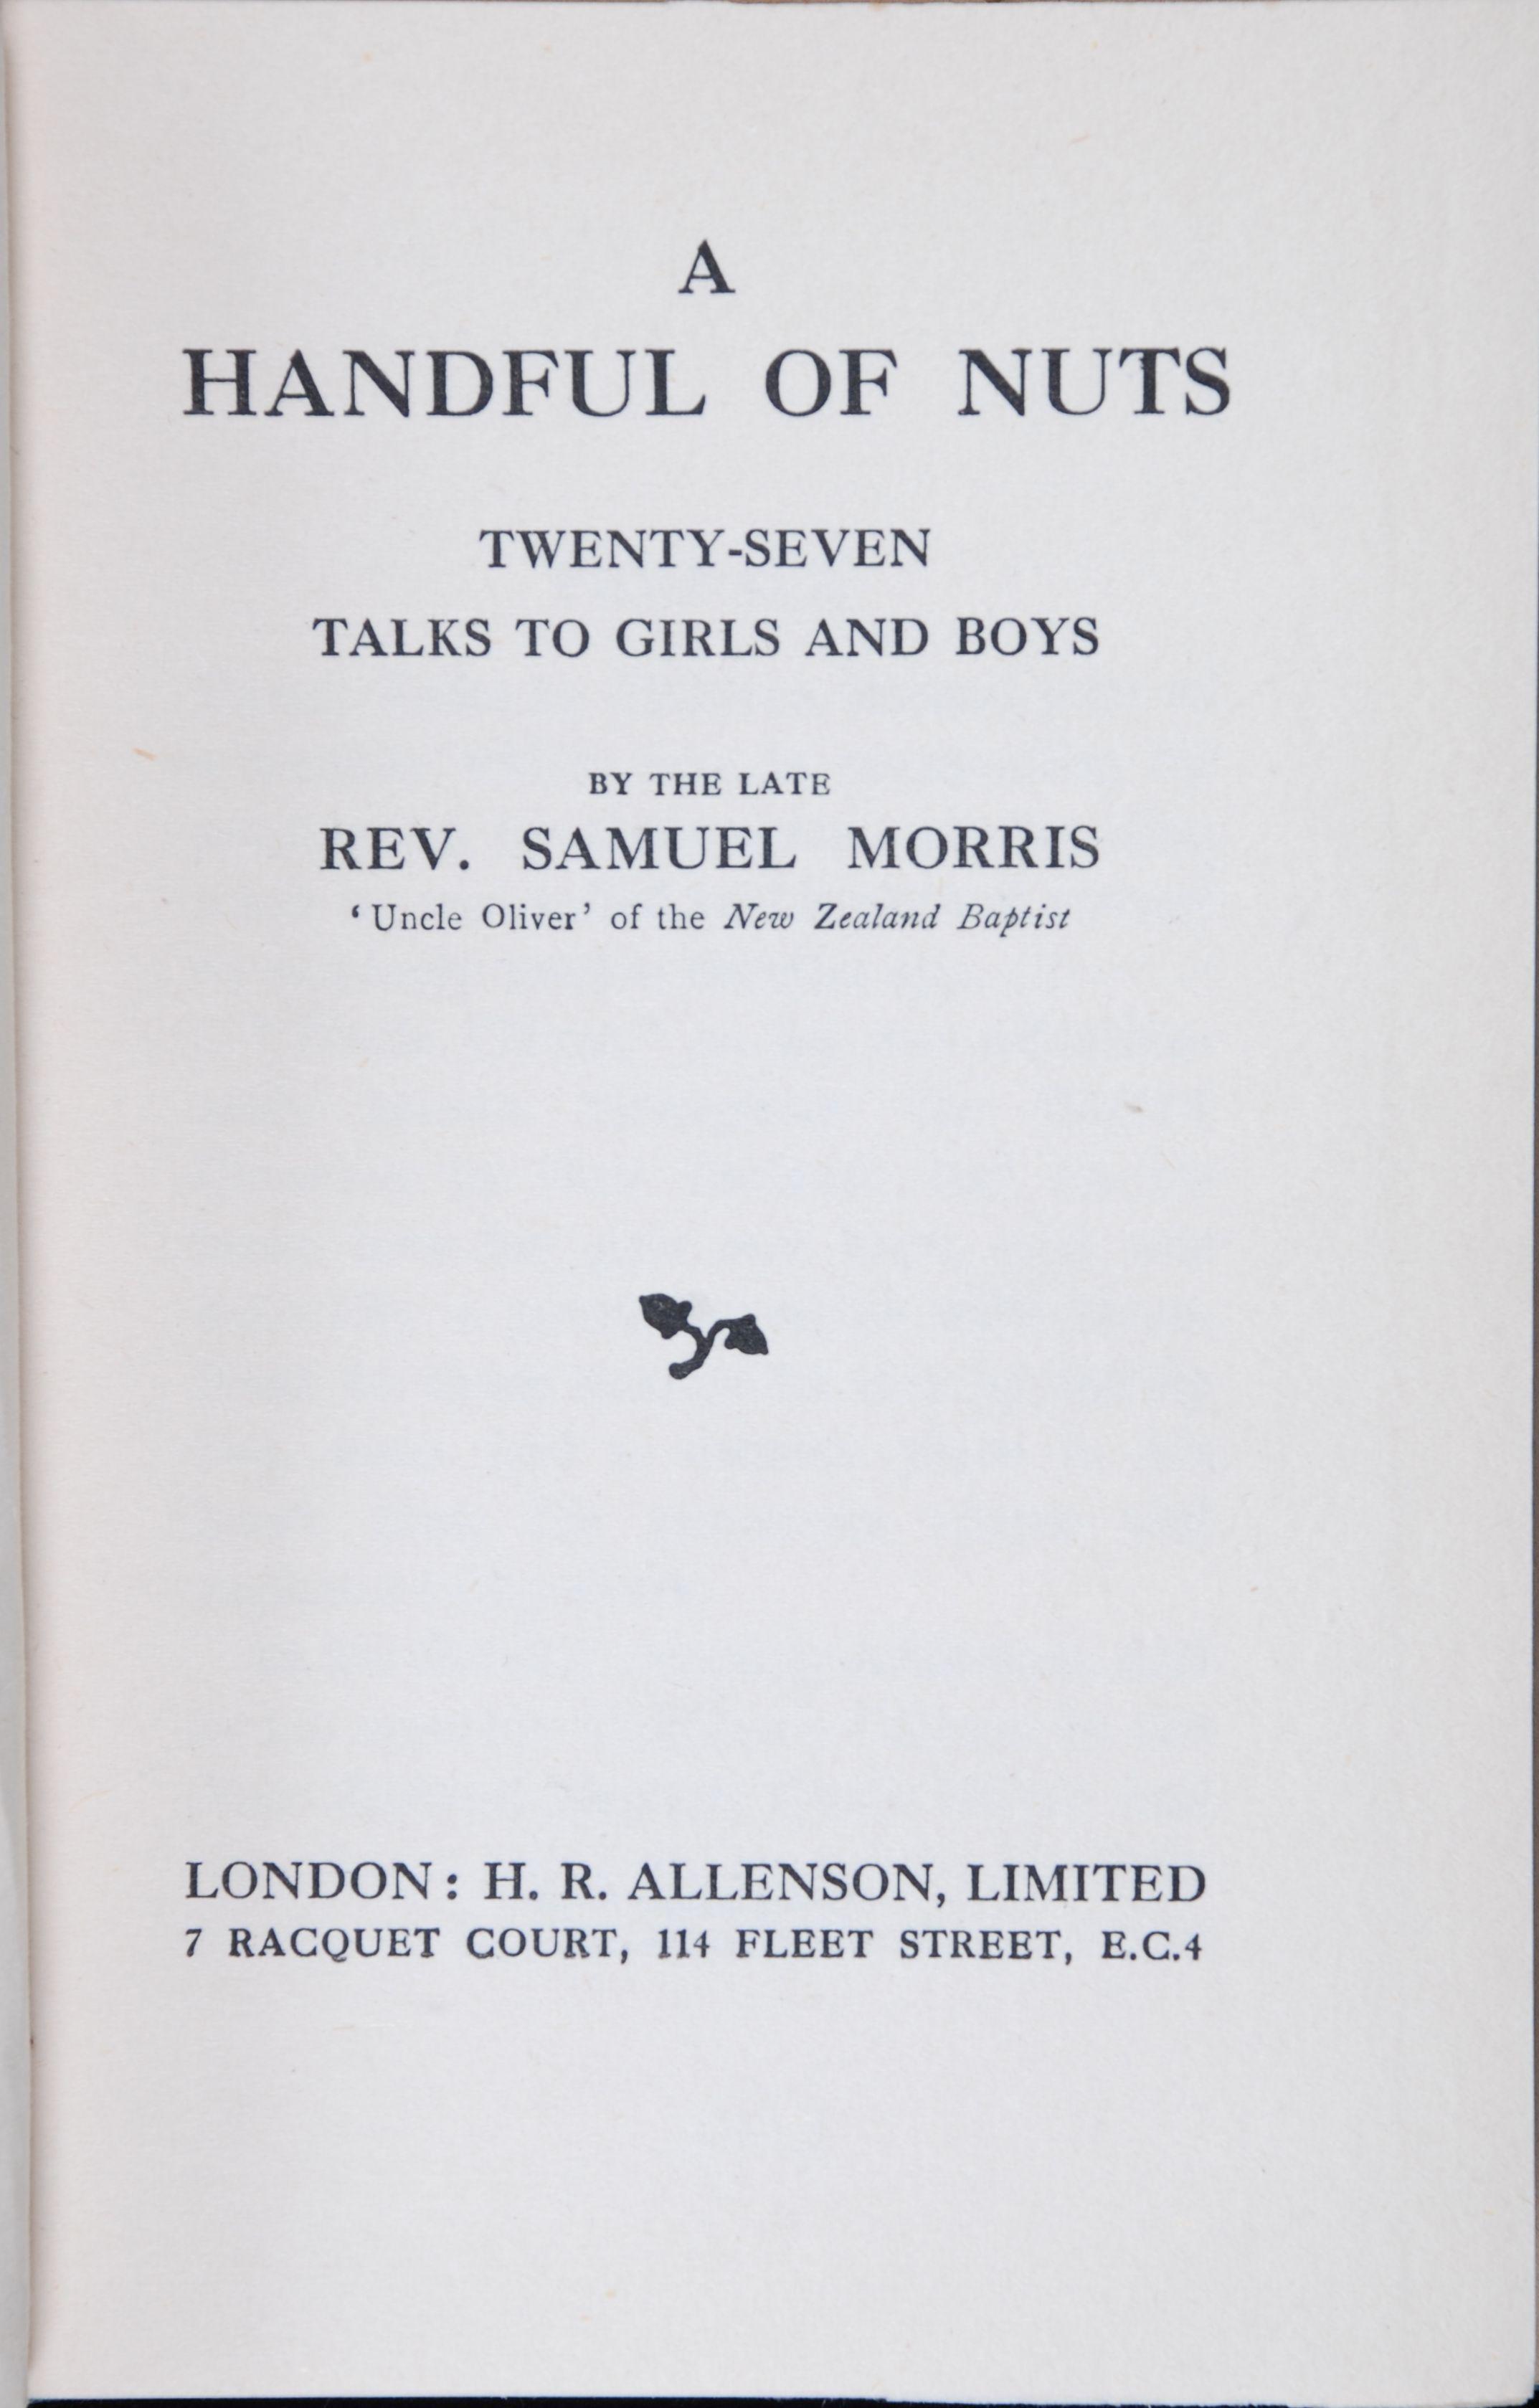 Samuel Morris. A handful of nuts : twenty-seven talks to girls and boys. London: H.R. Allenson, [1926].